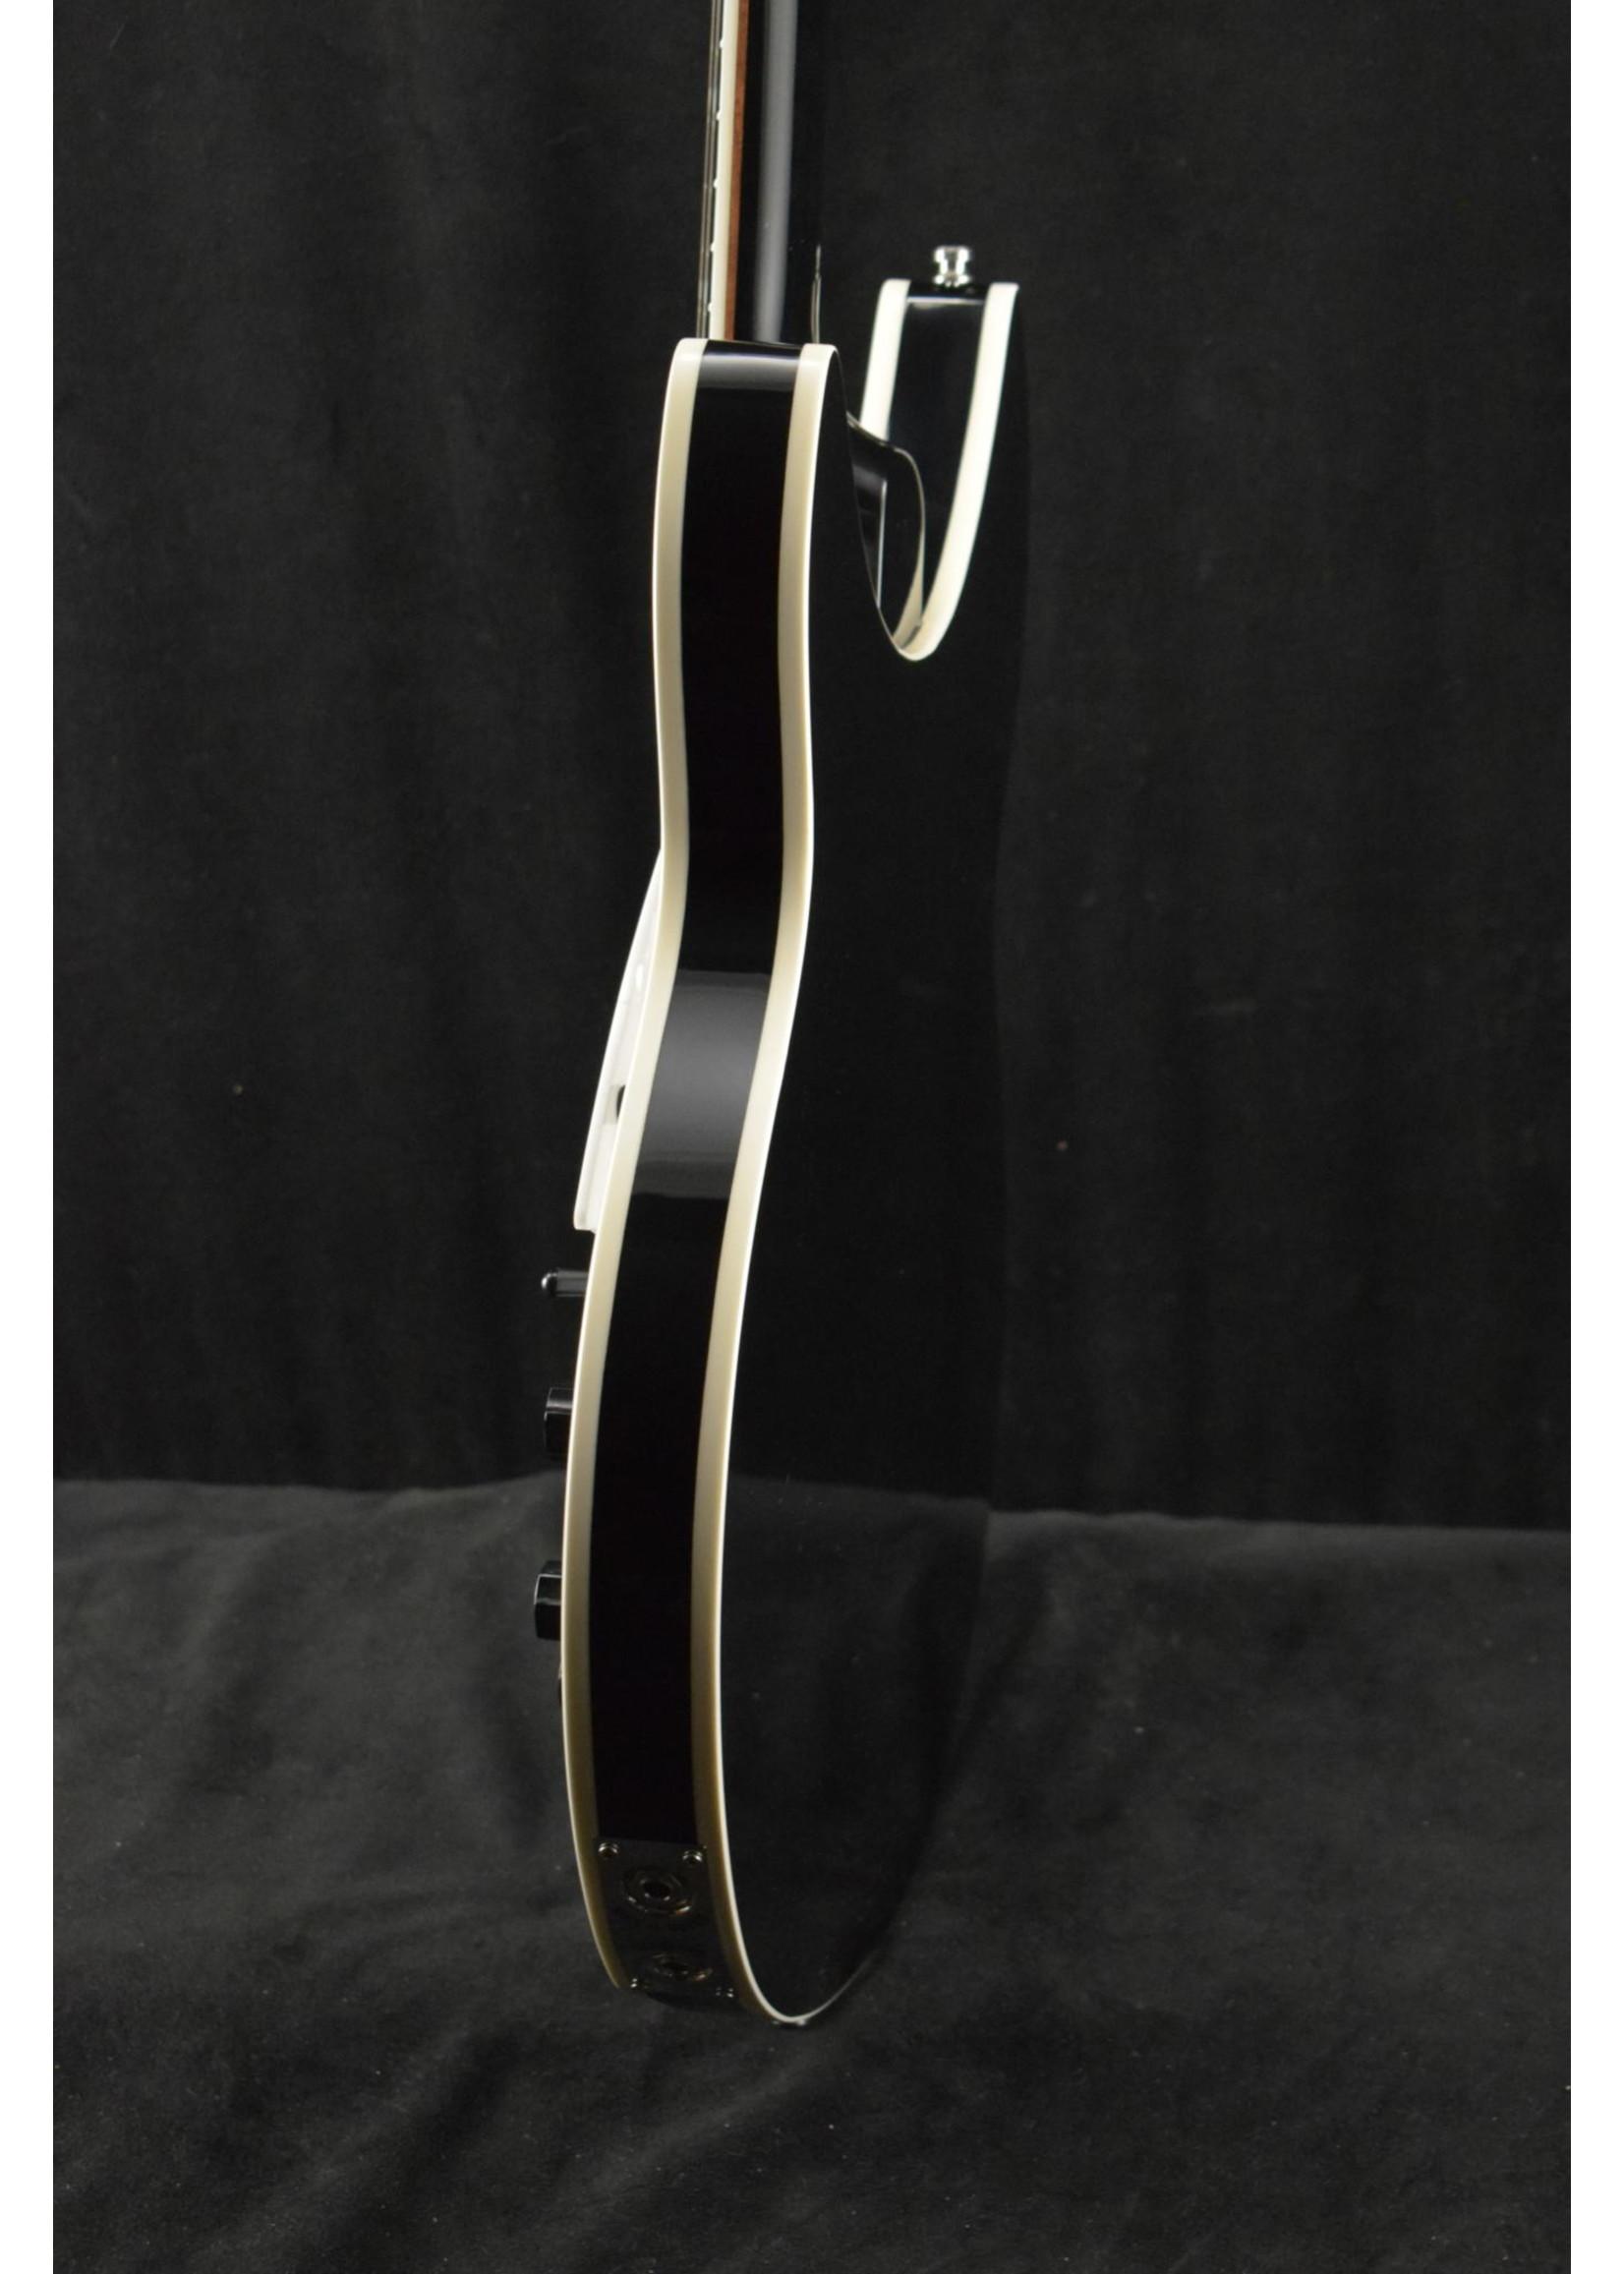 Rickenbacker Rickenbacker 1993Plus 12-String Jetglo